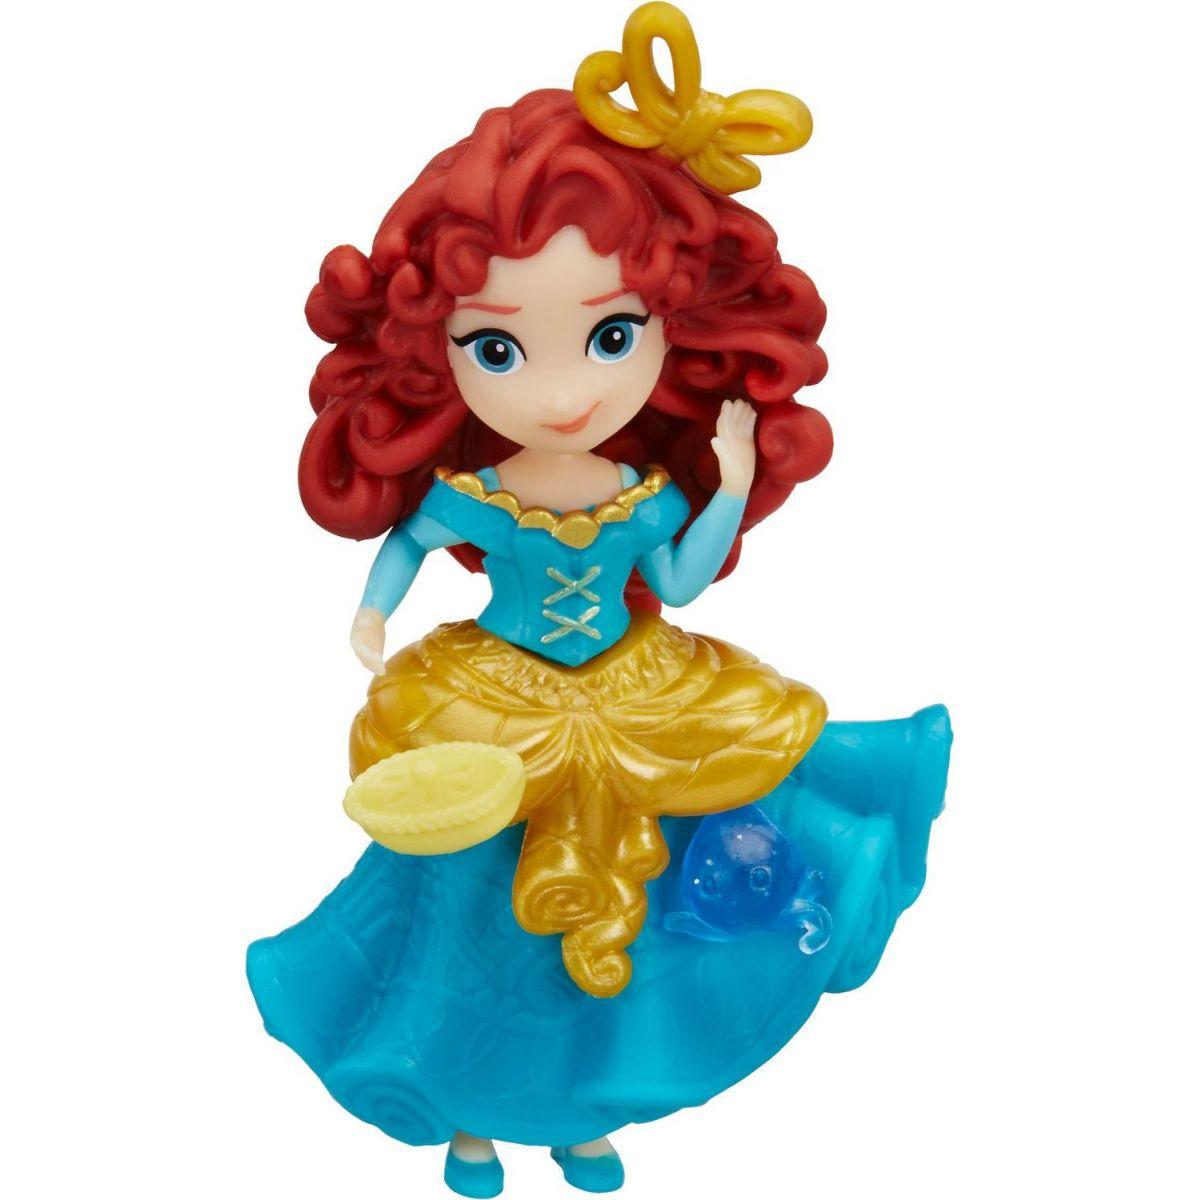 Hasbro Disney Princess Mini panenka Merida B7152